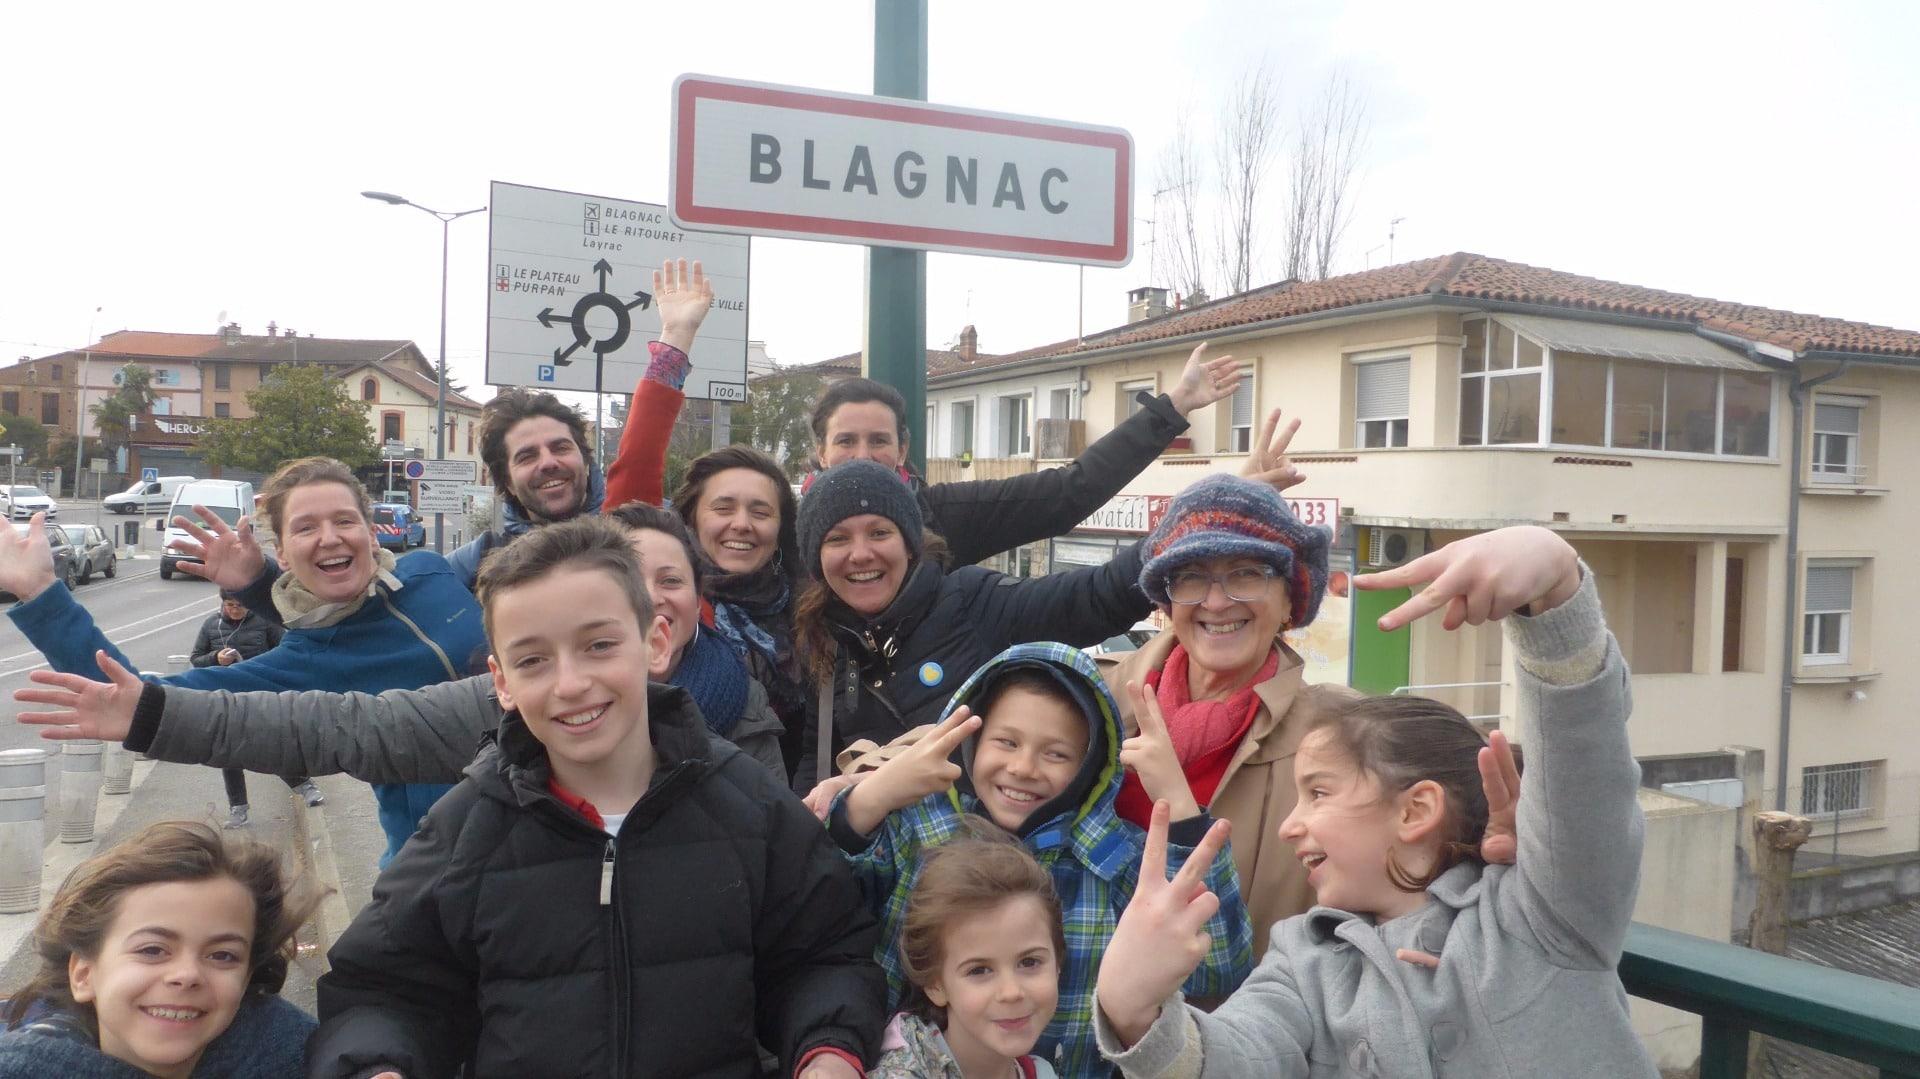 Blagnac_Incroyables-Comestibles_Incredible-Edible